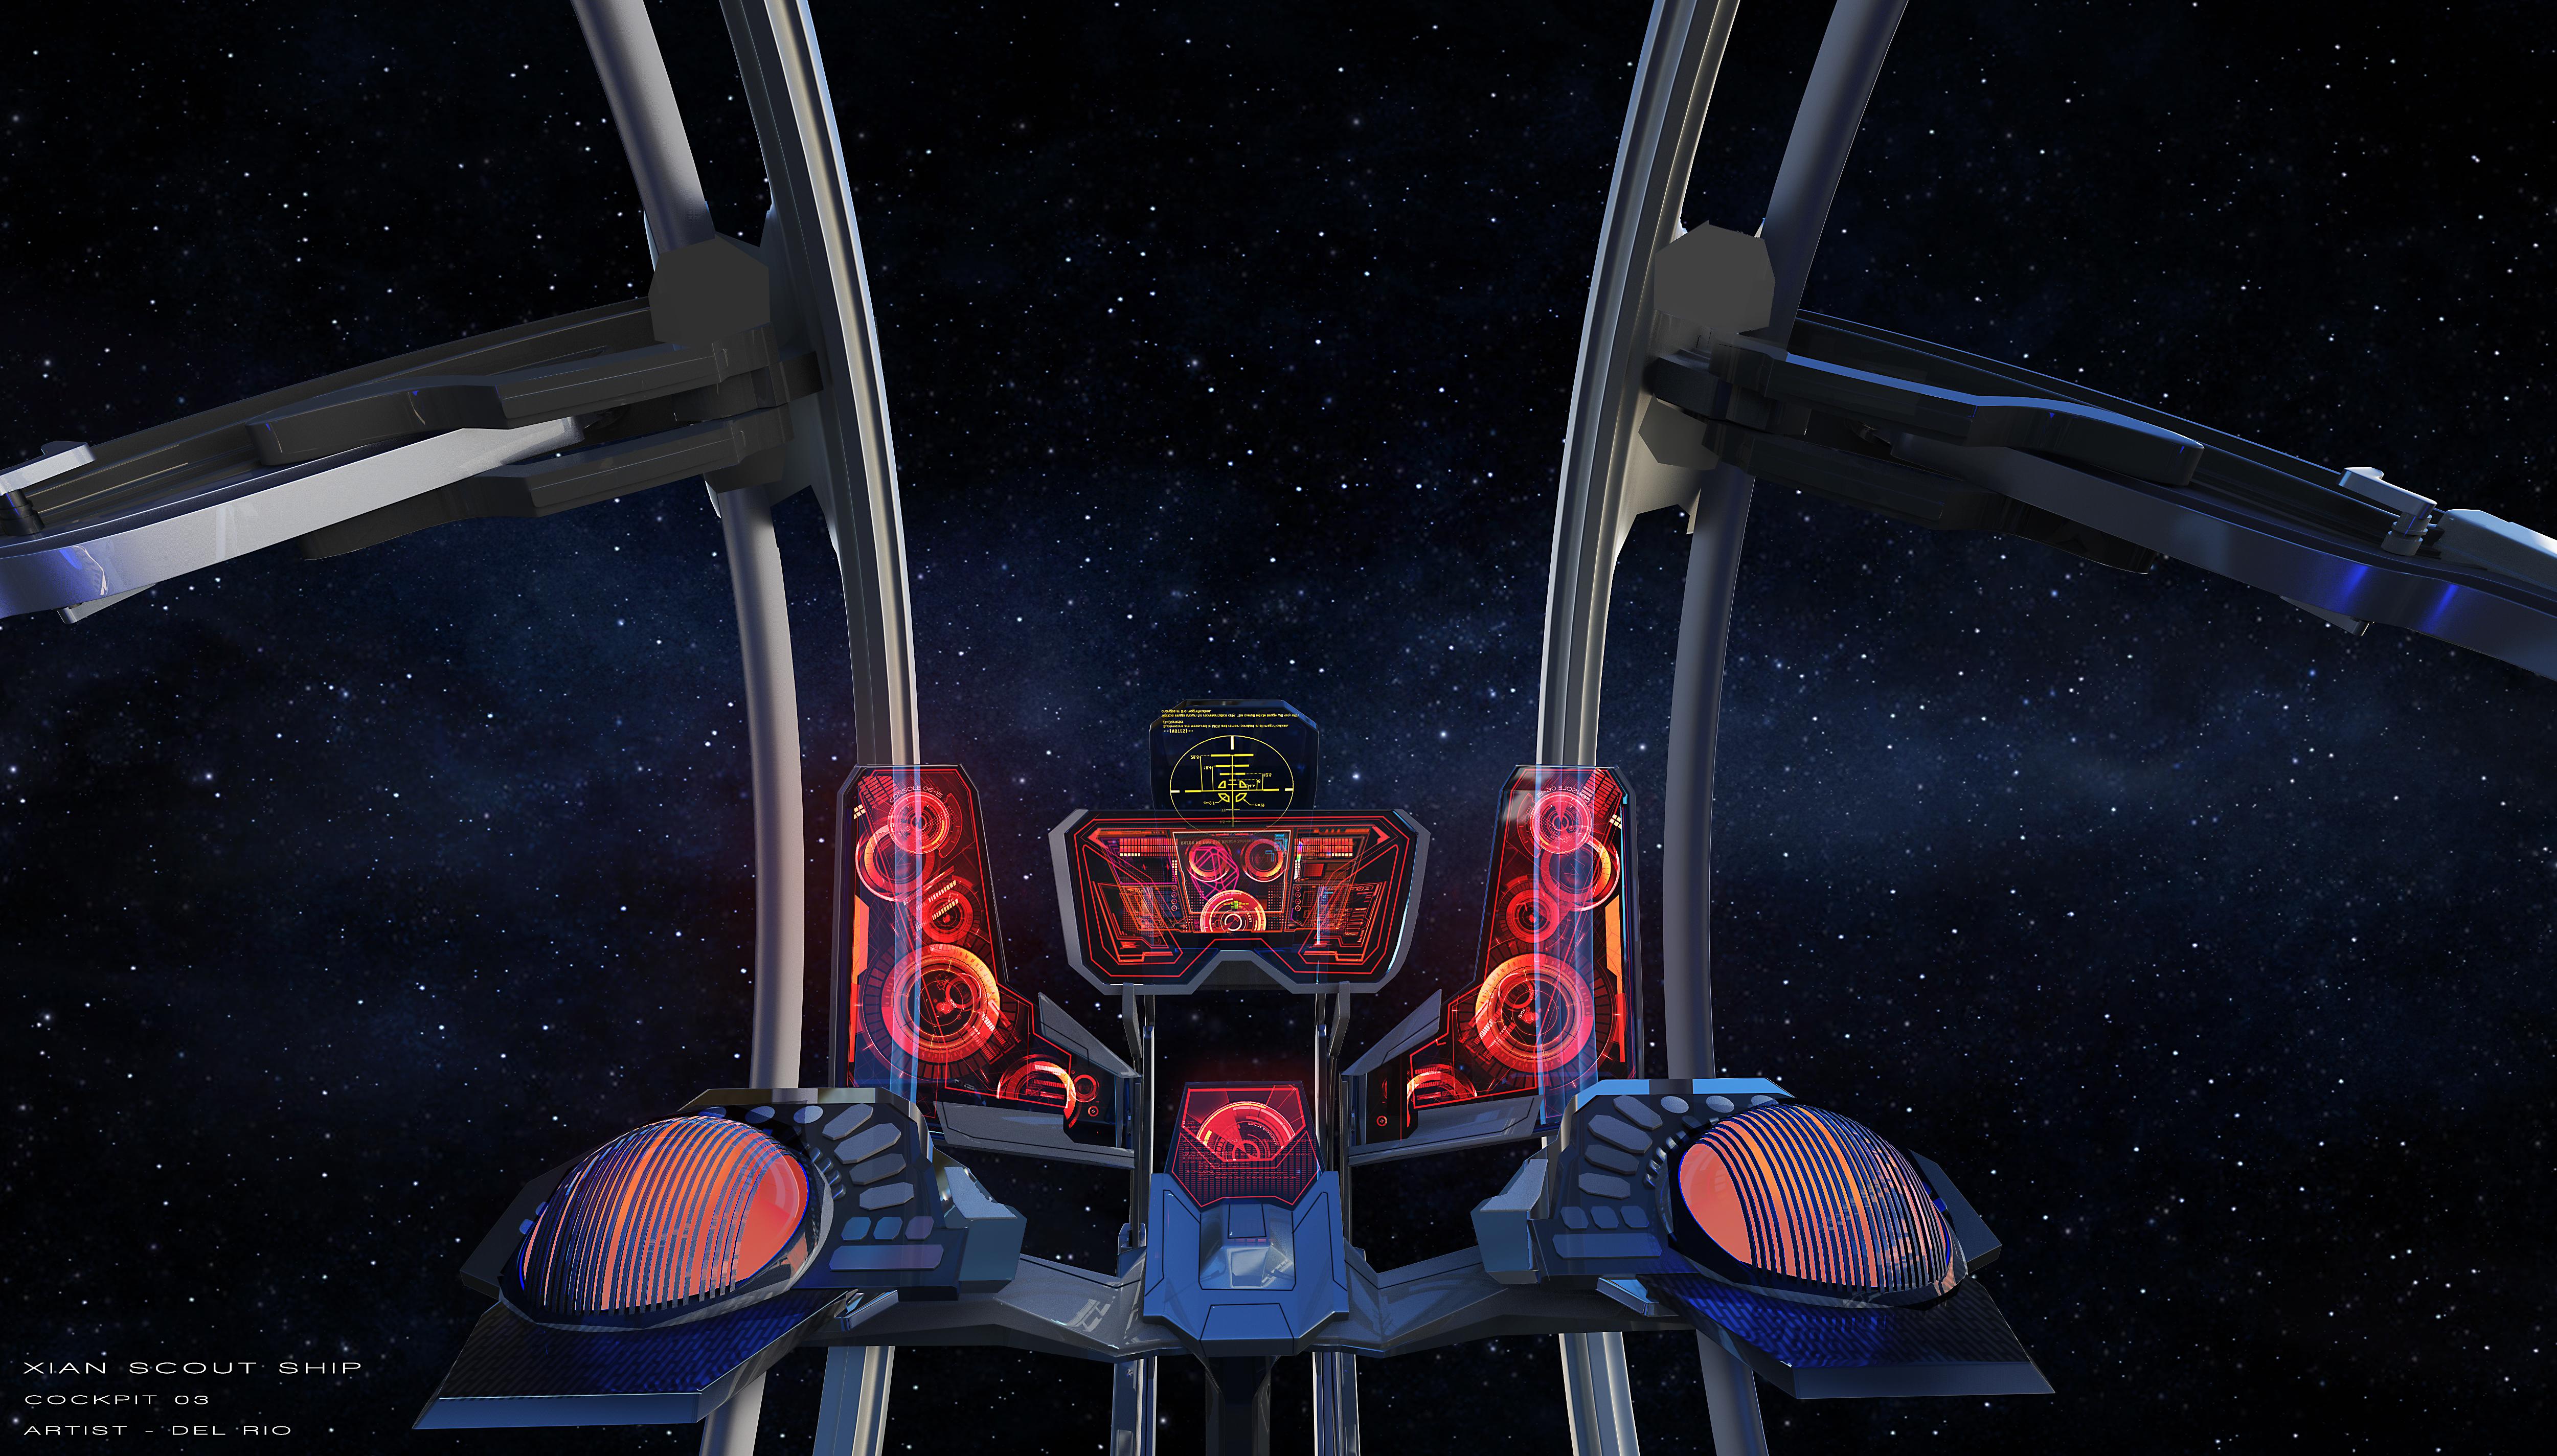 Xian_scout__ship_cockpit_03.jpg